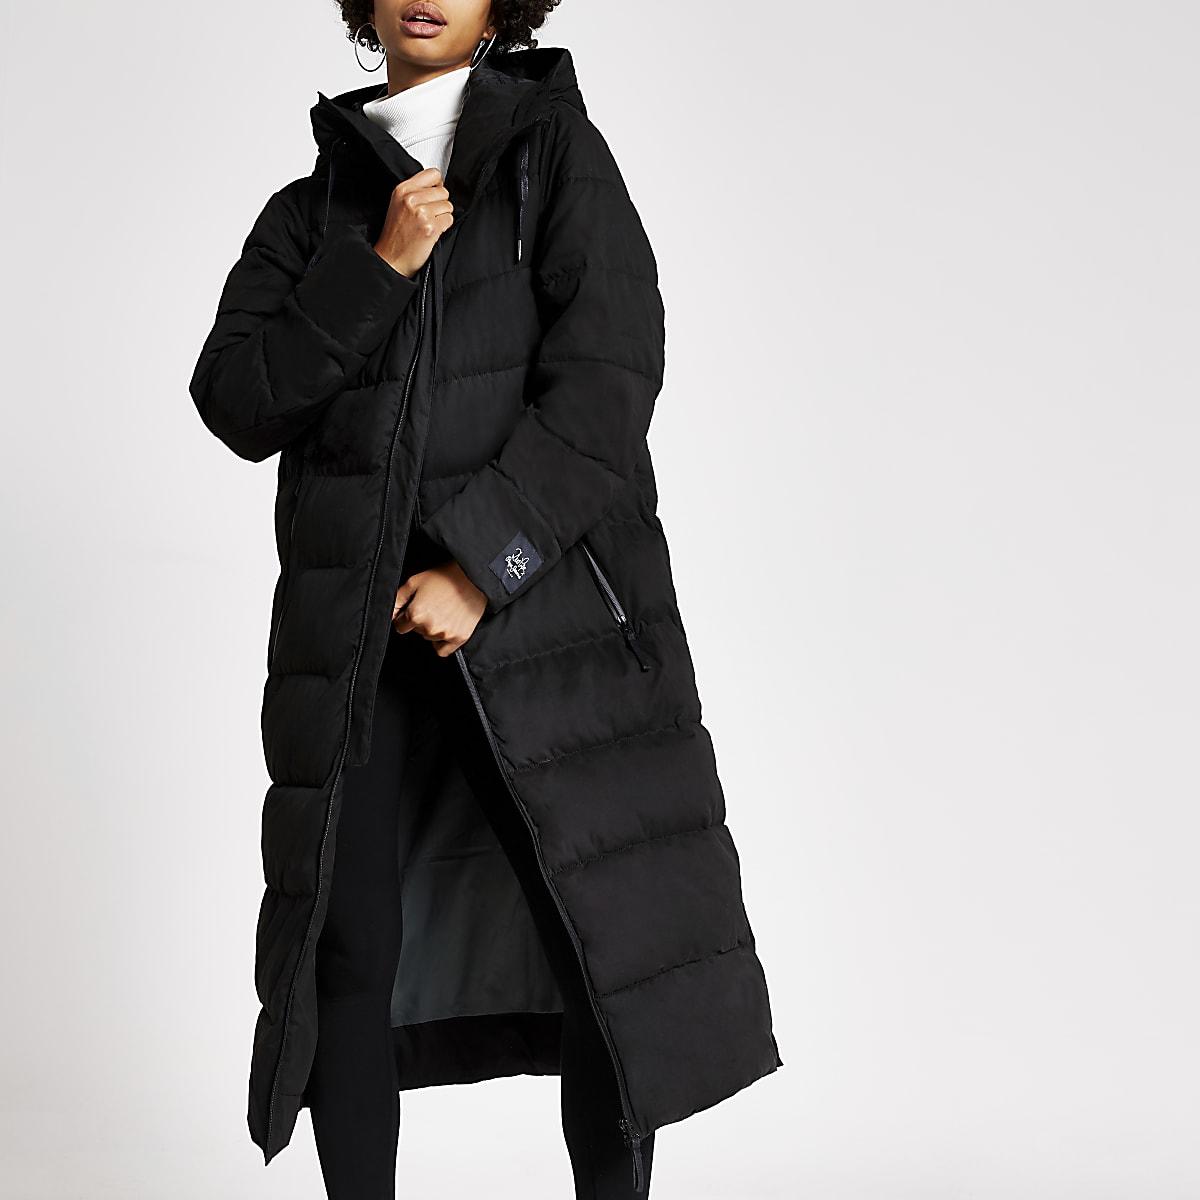 Dua Lipa x Pepe Jeans - Zwarte gewatteerde jas